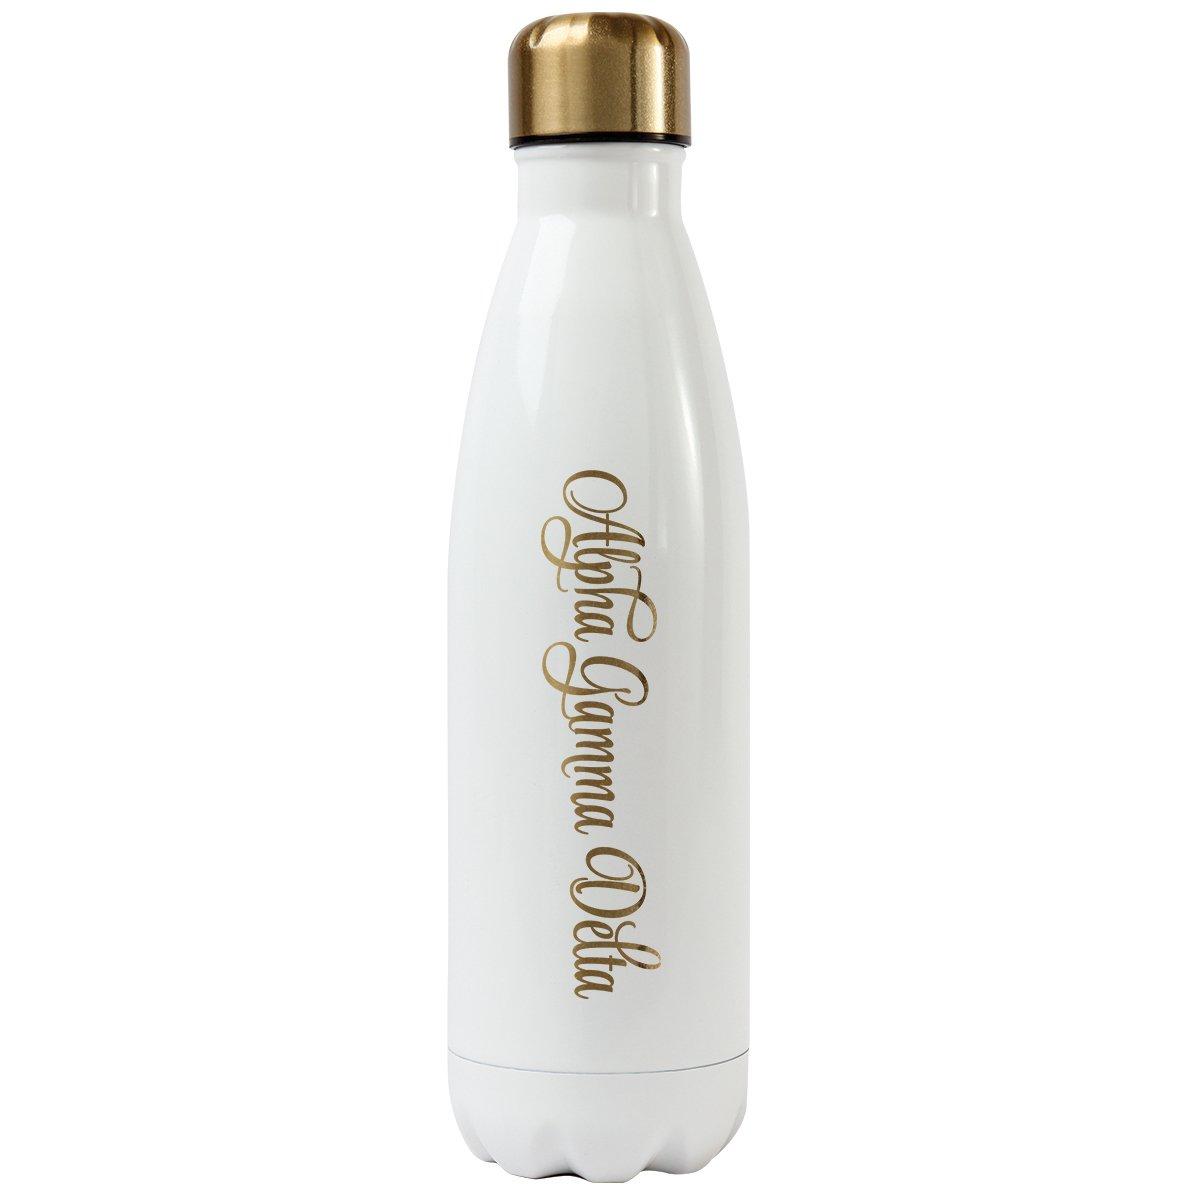 Alpha Gamma Delta Alexandra and Company Water Bottle, Delta Delta Delta